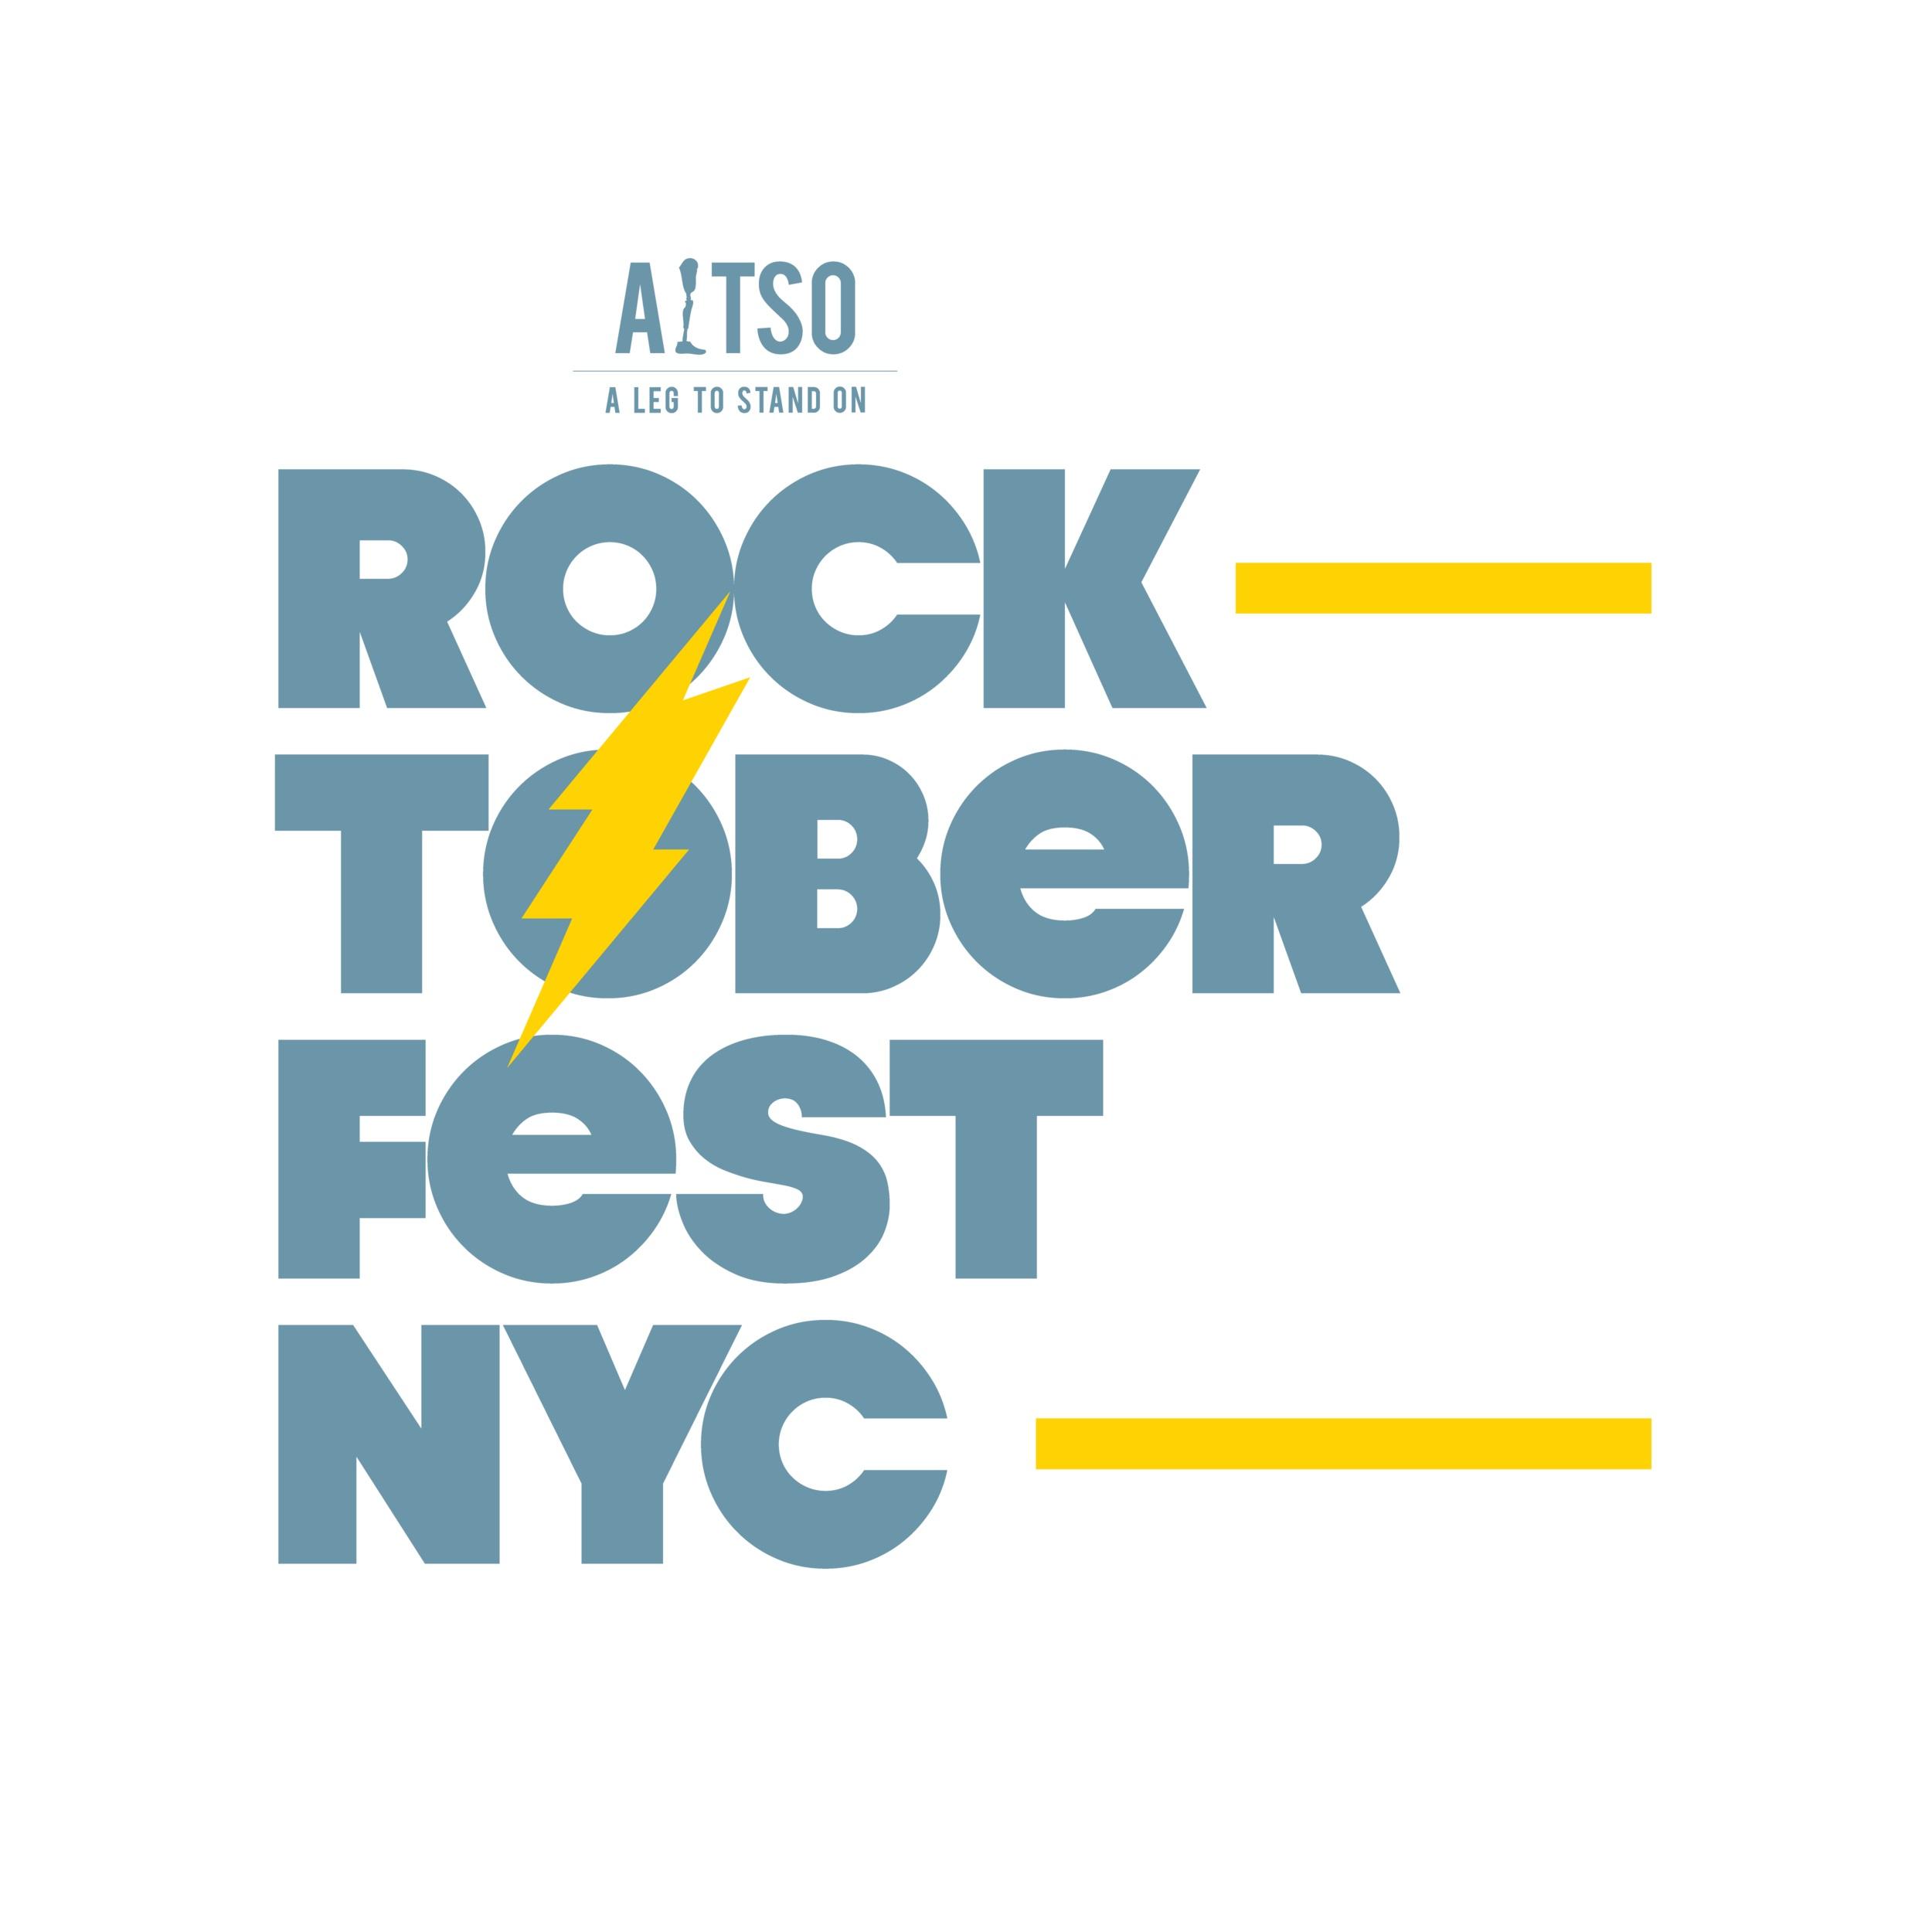 ROCKTOBERFEST_NYC.jpg